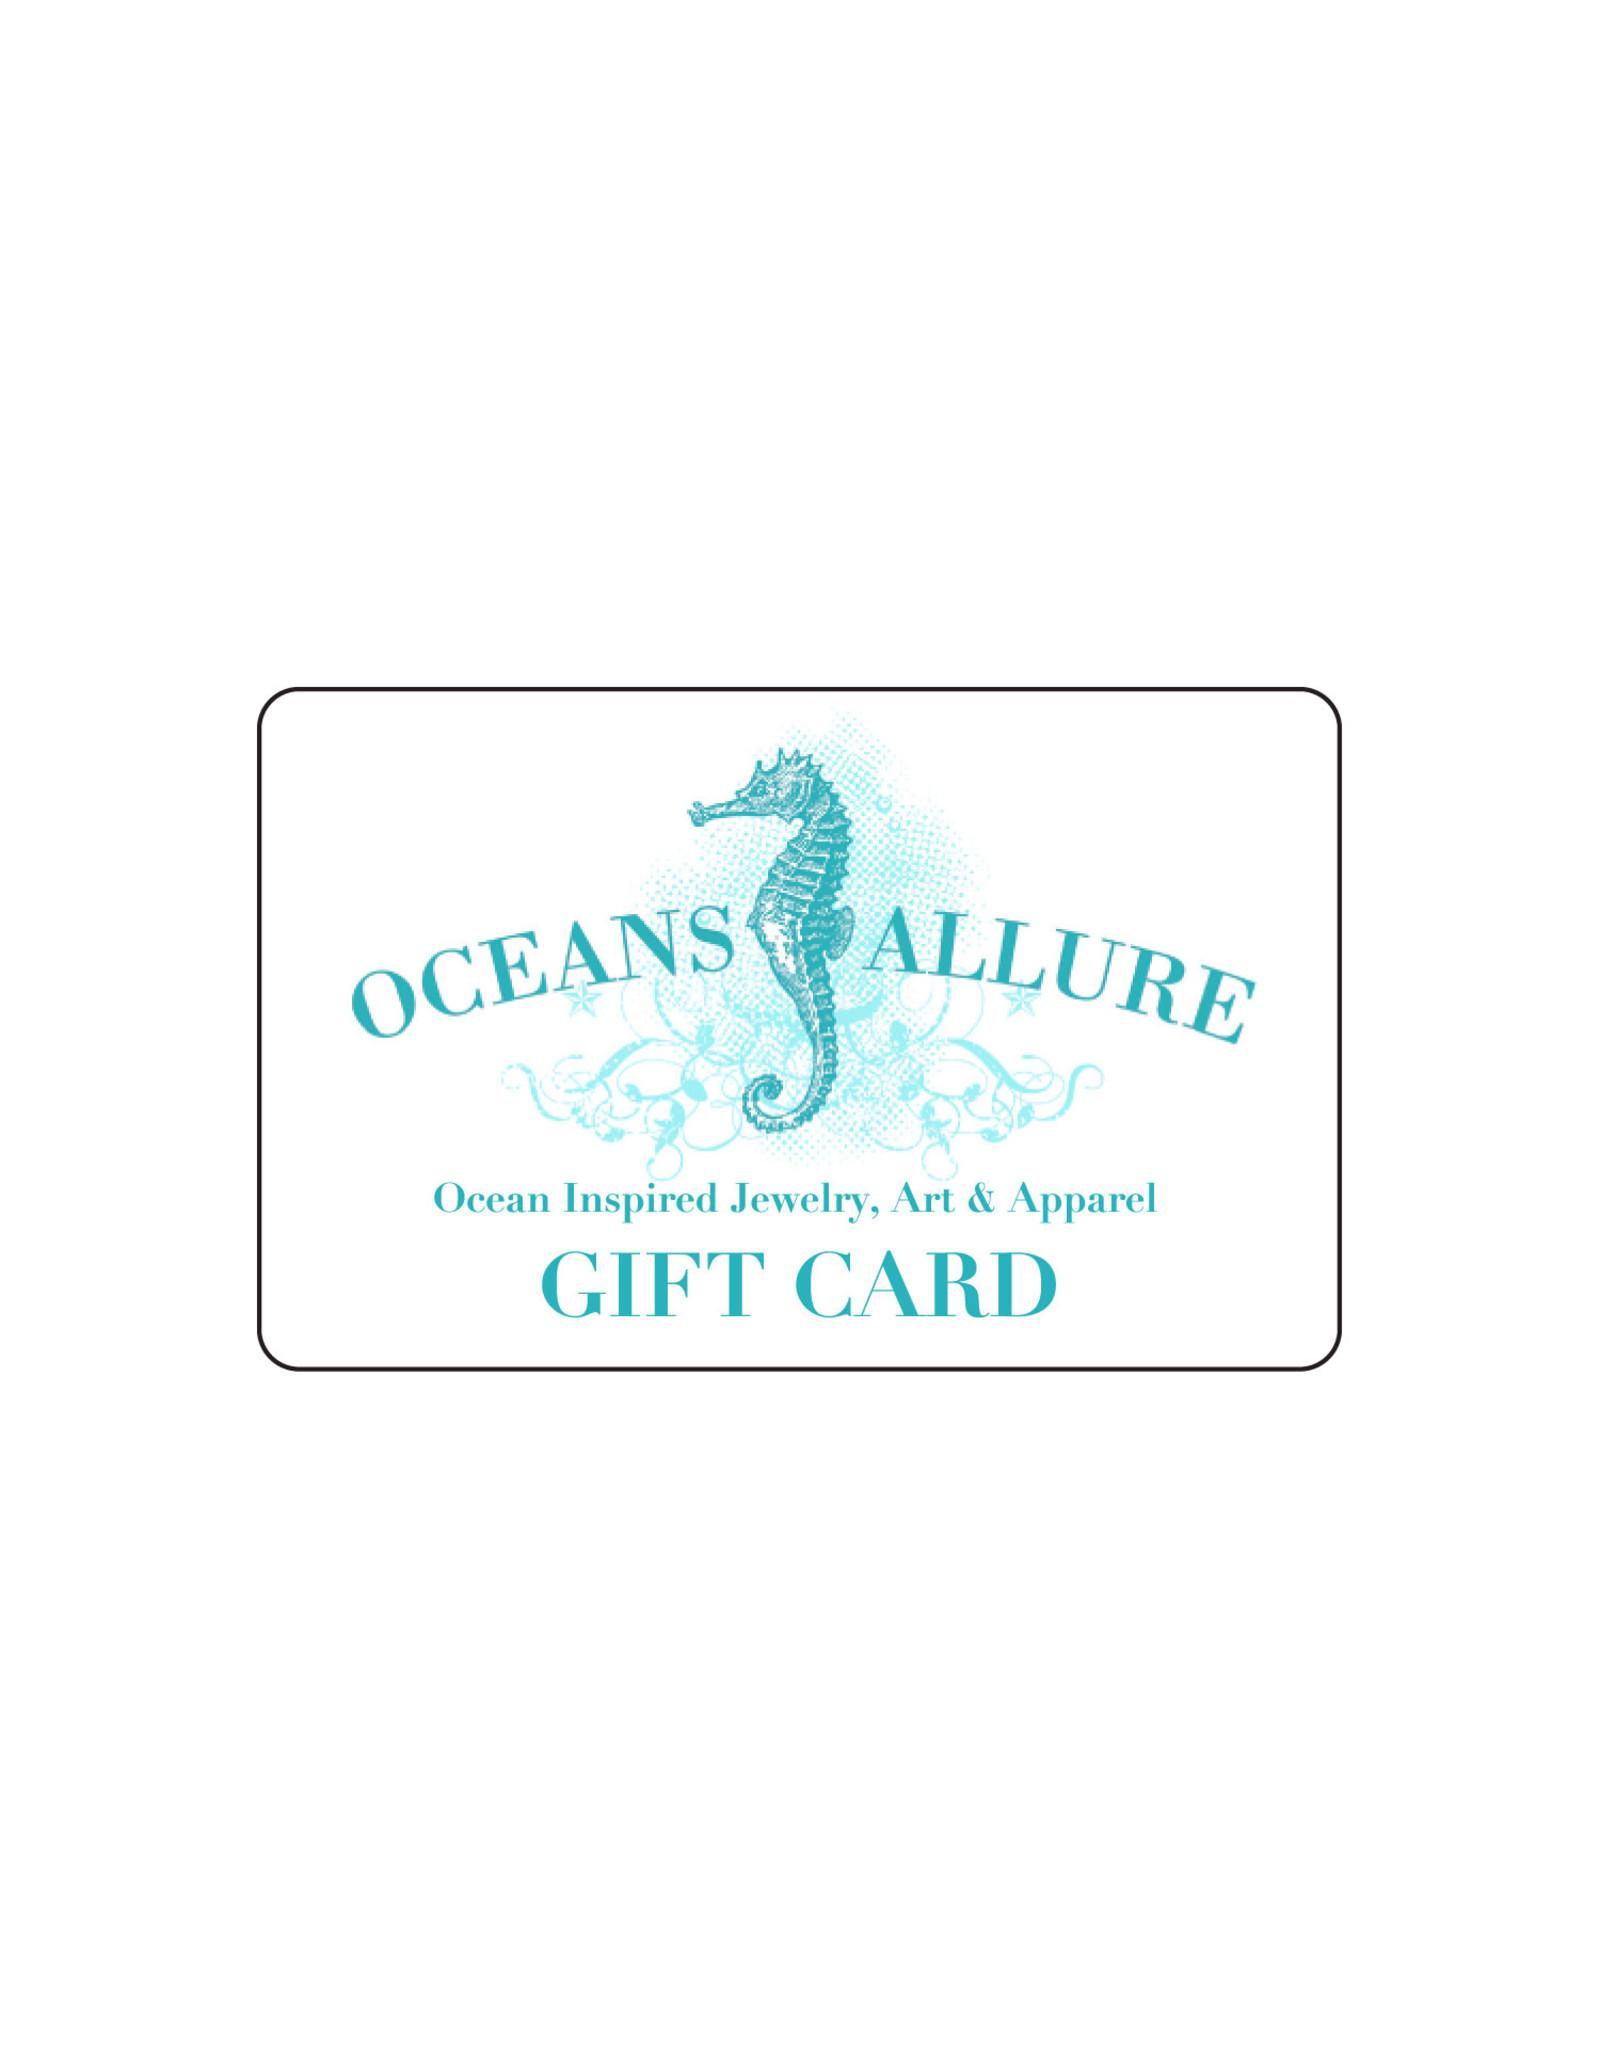 Oceans Allure Gift Card